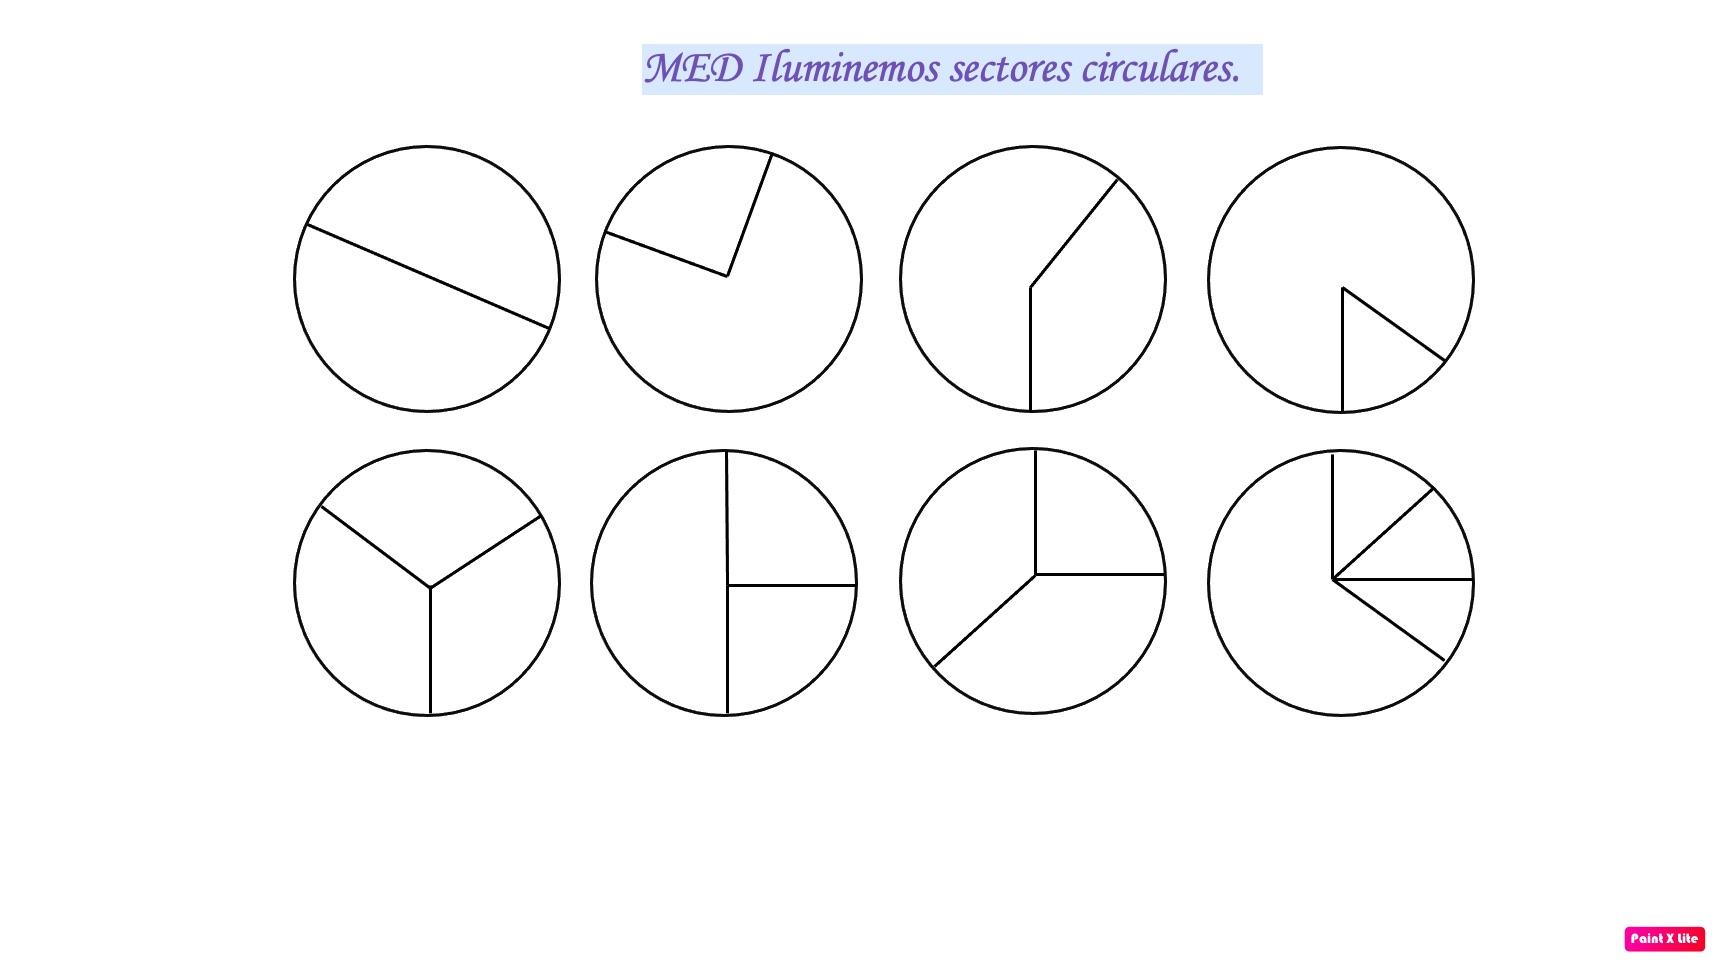 869077278566625T194202111830_Iluminemos+sectores+circulares.jpg